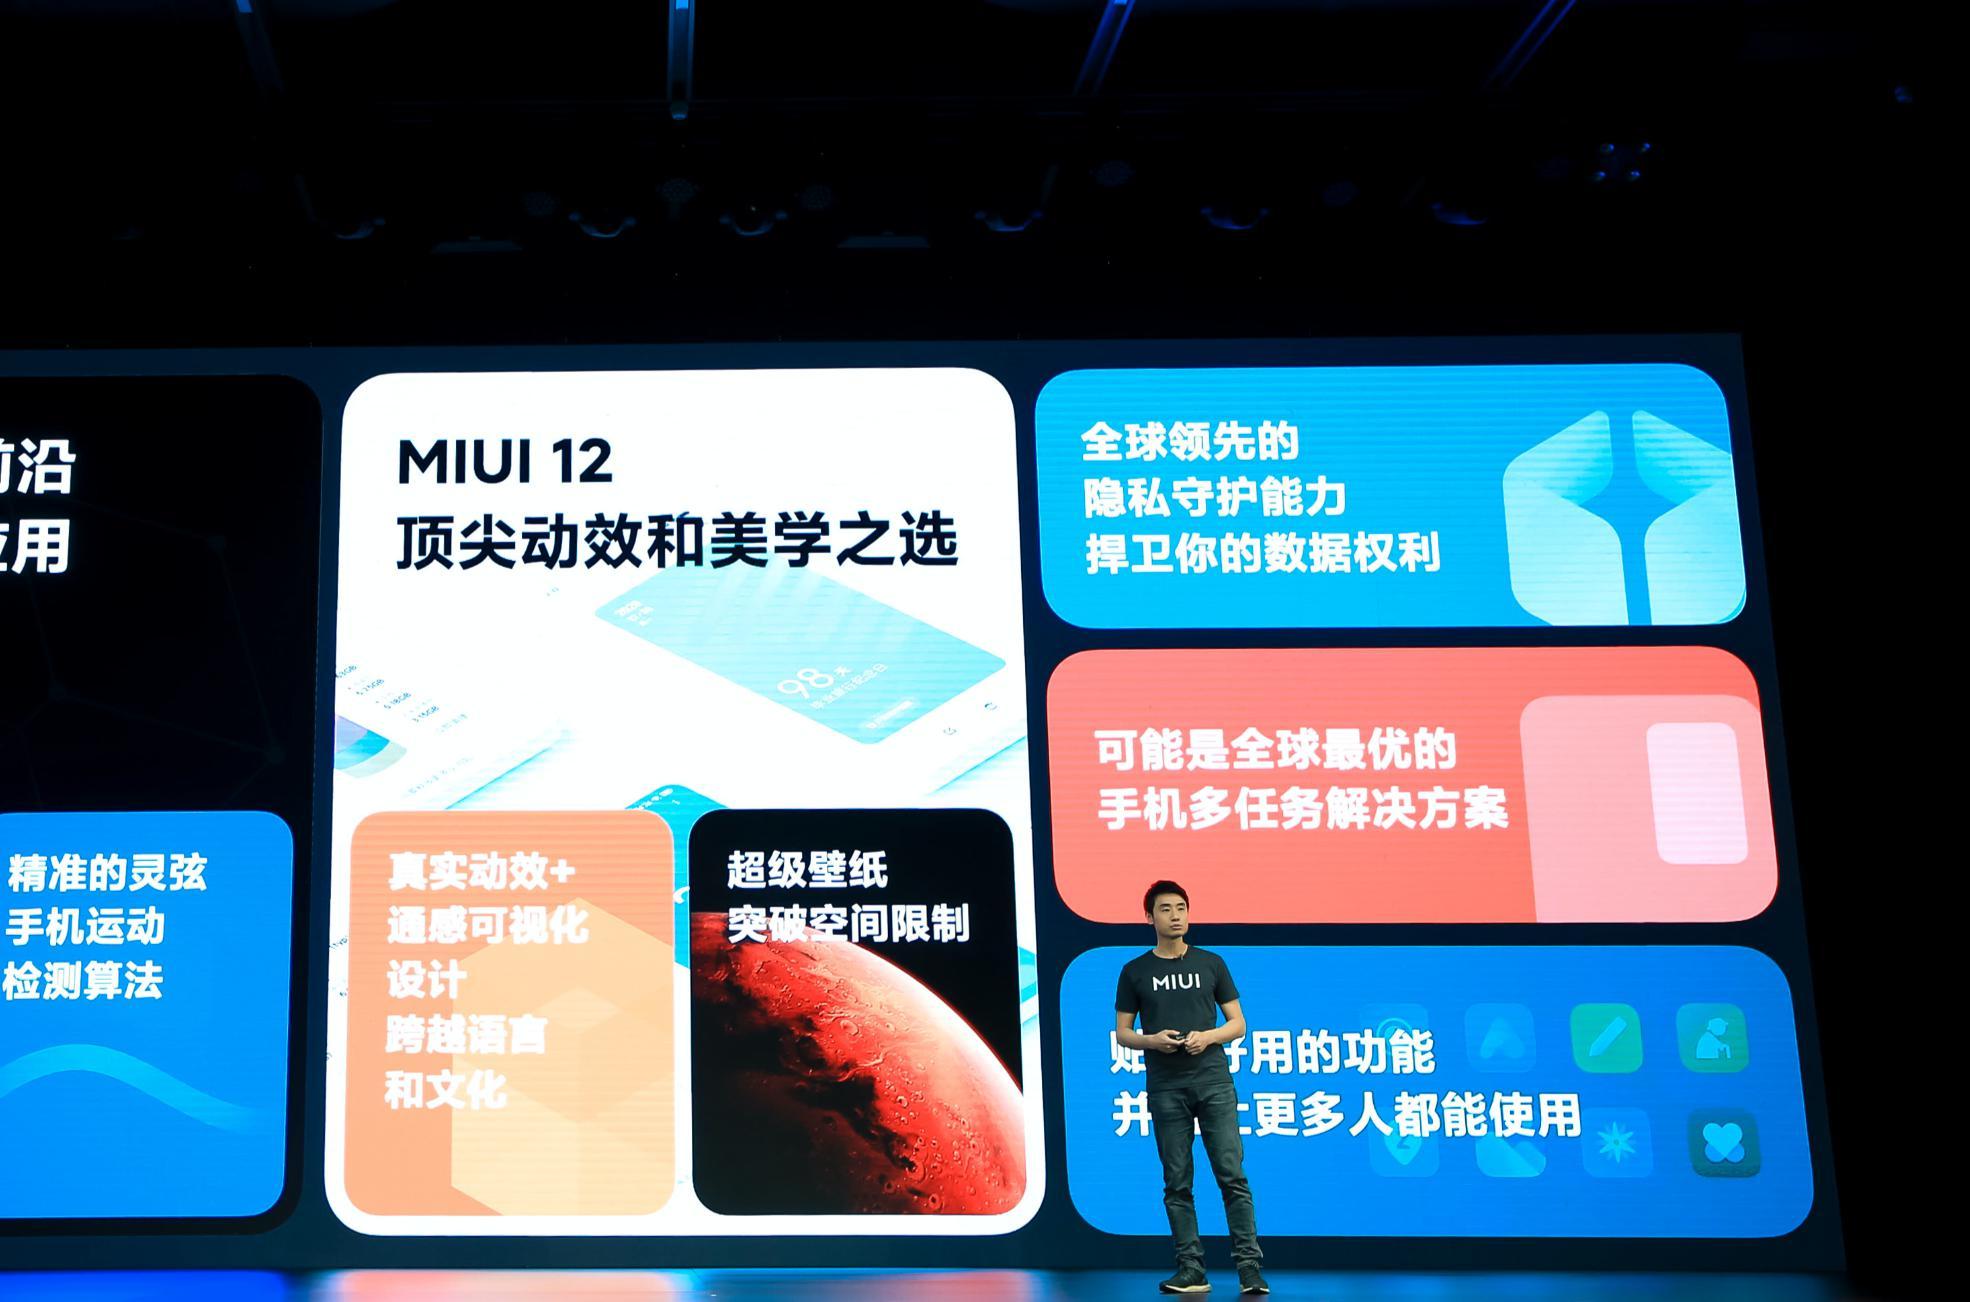 iPhone 12 推迟1个月发布;6月 1 日实施新网络审查办法;小鹏 P7 上市 22.99万元起